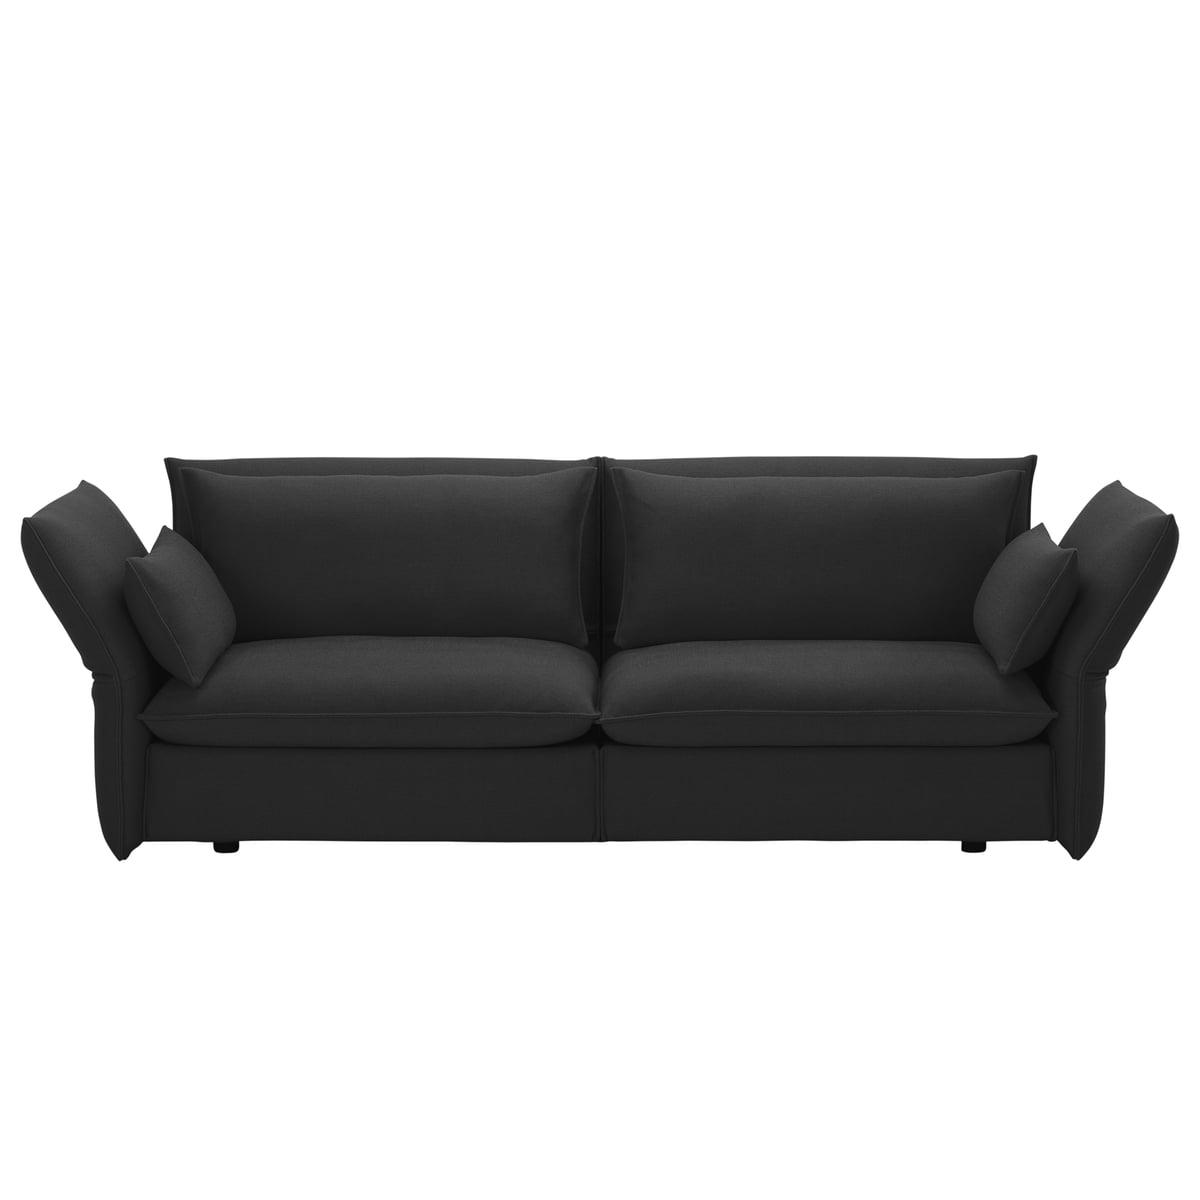 Mariposa Sofa 3 Seater By Vitra, Laser Dark Grey